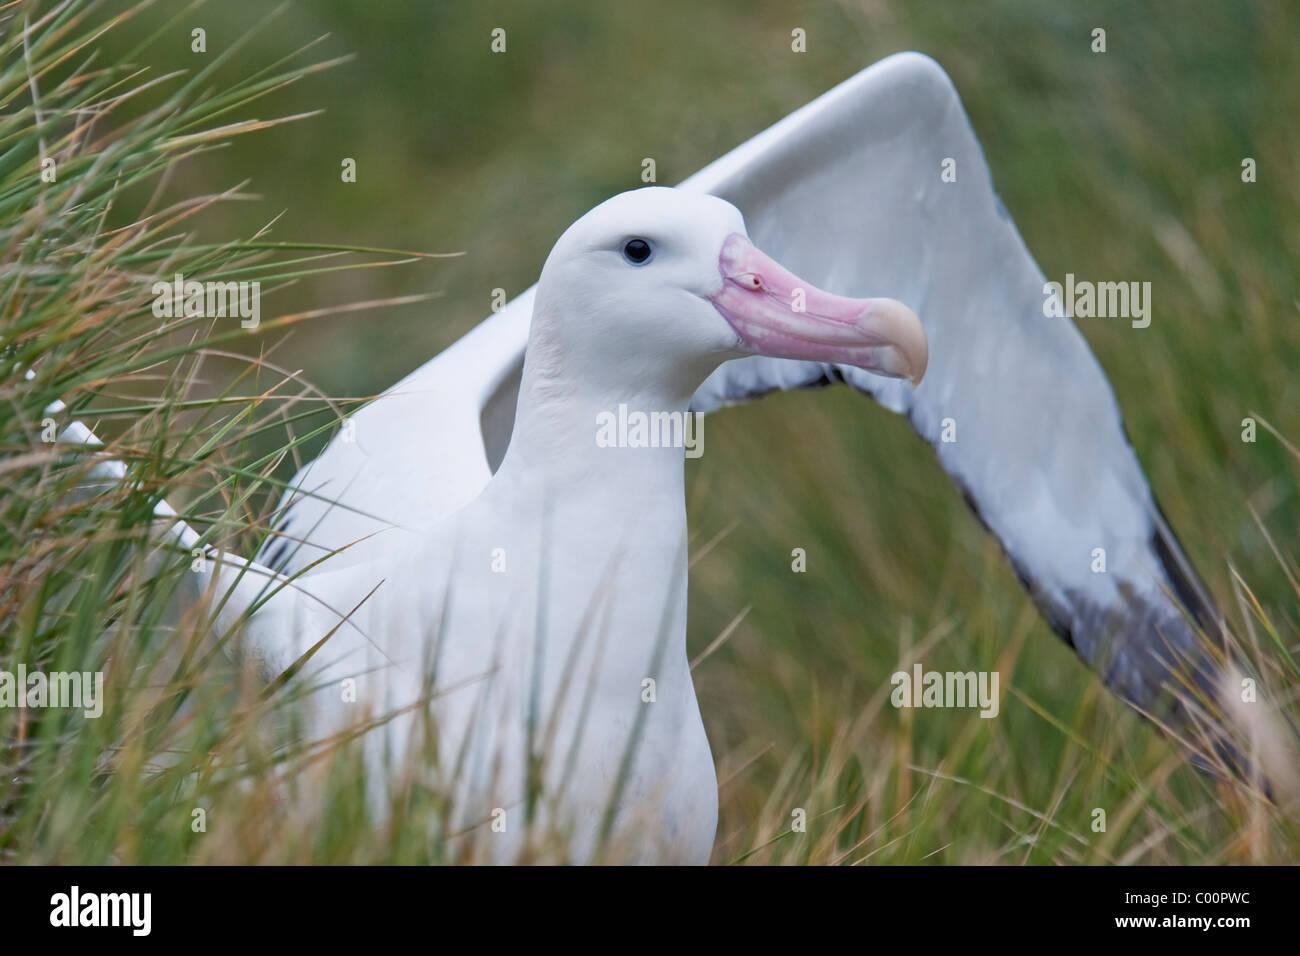 Wondering Albatross (Diomedea exulans) adult bird displaying. South Georgia, South Atlantic Ocean. - Stock Image